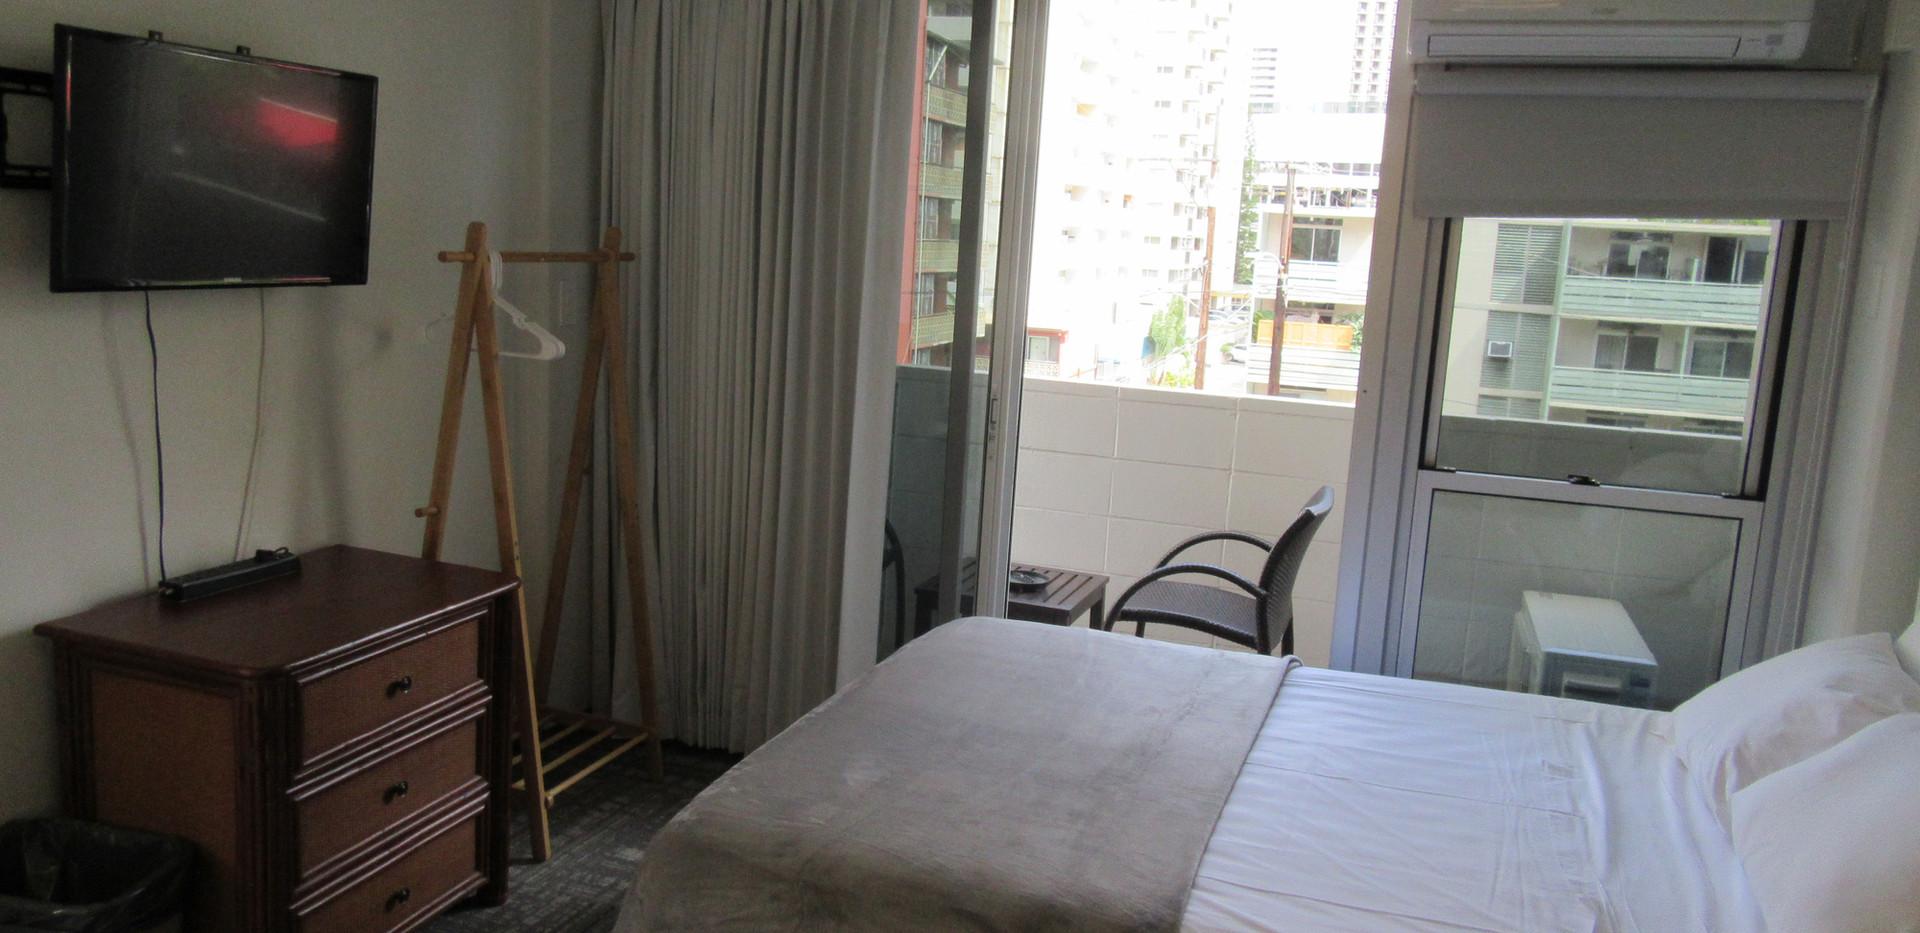 View of economy 1 queen bed room